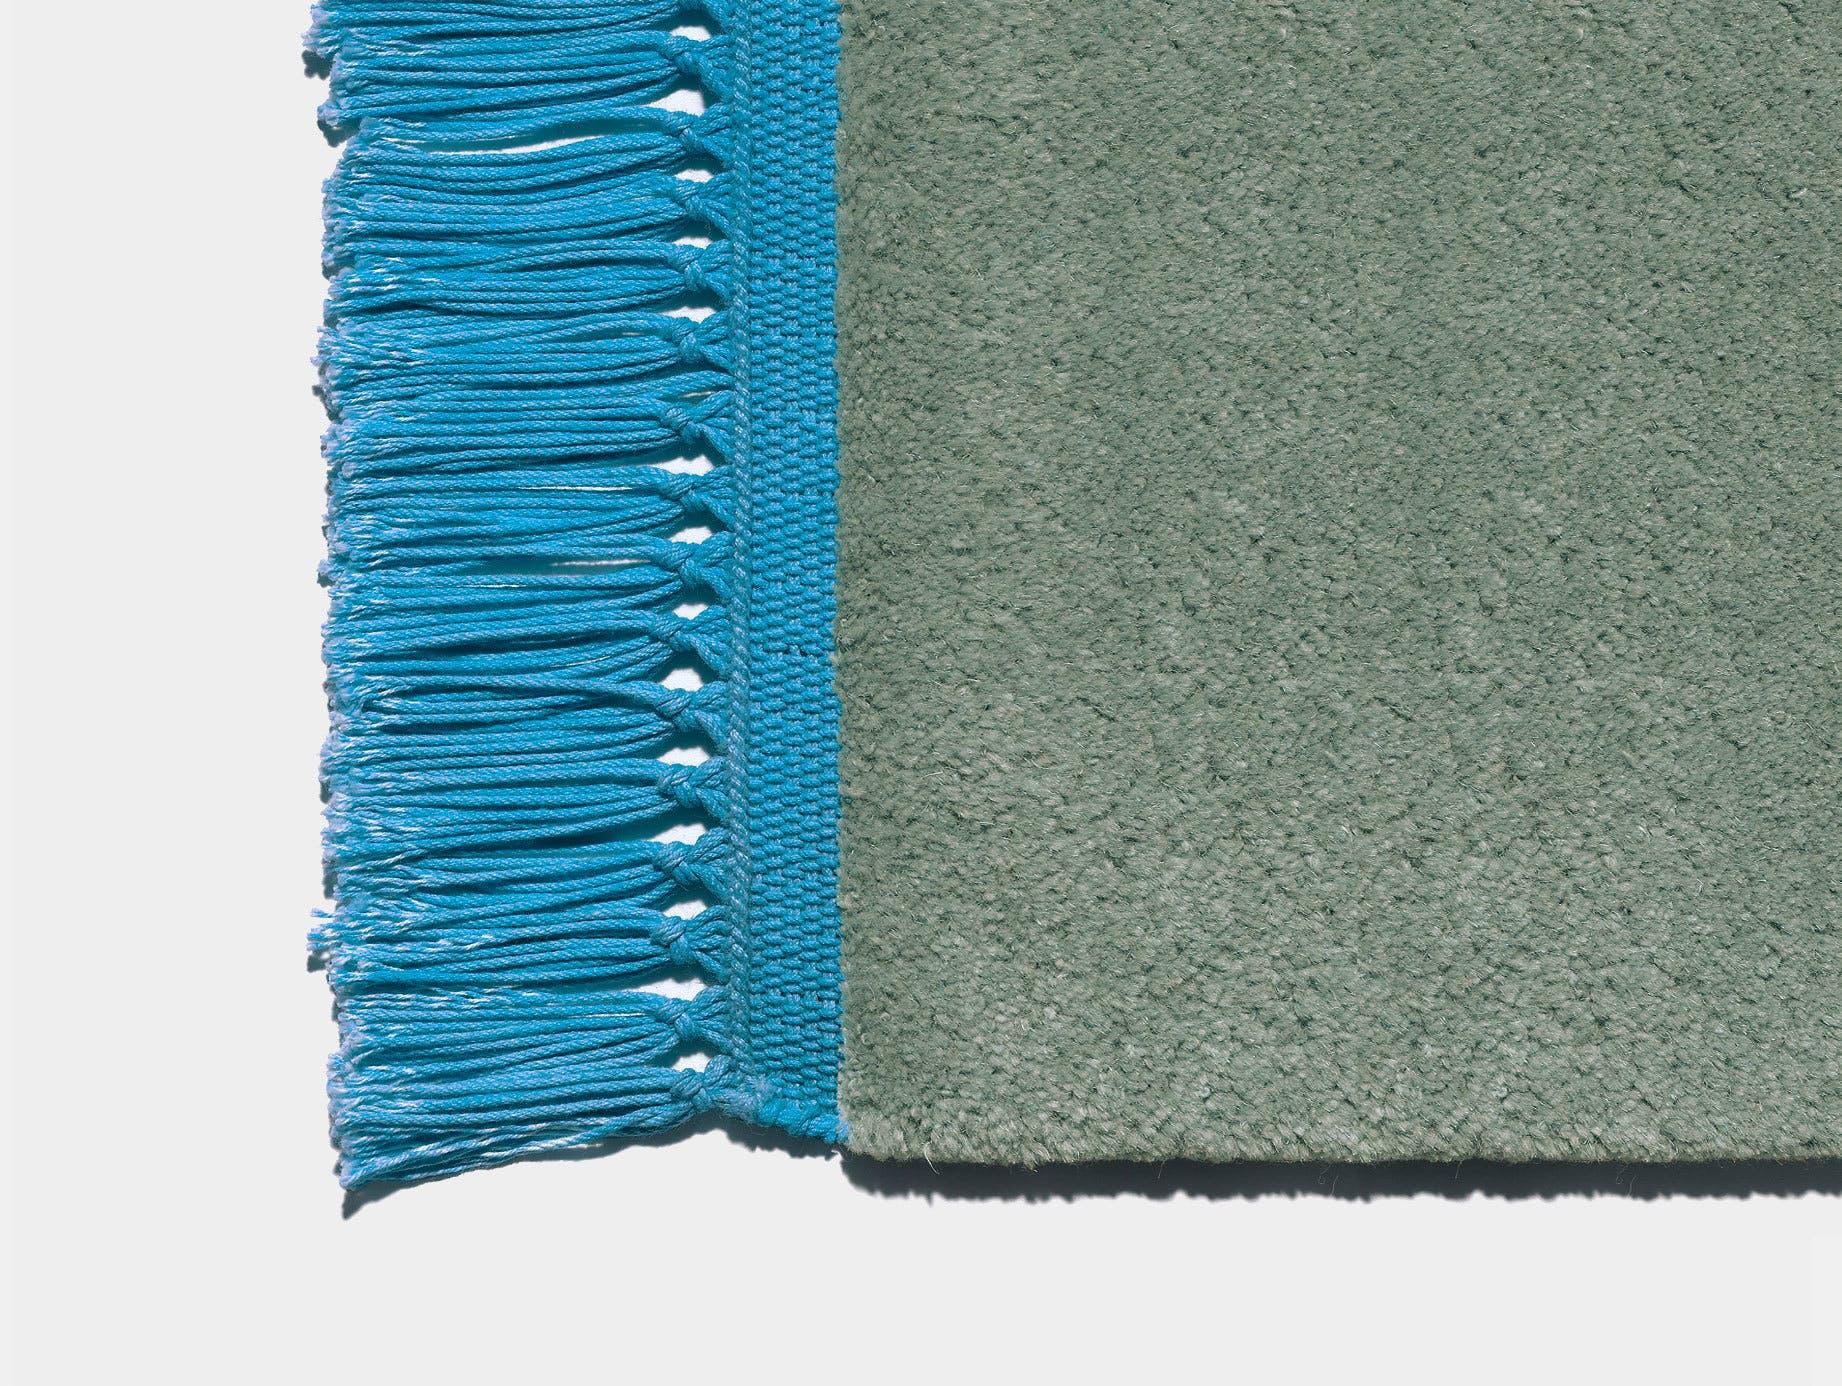 E15 Kavir Rug Pale Mint Turquoise Blue Philipp Mainzer Farah Ebrahimi